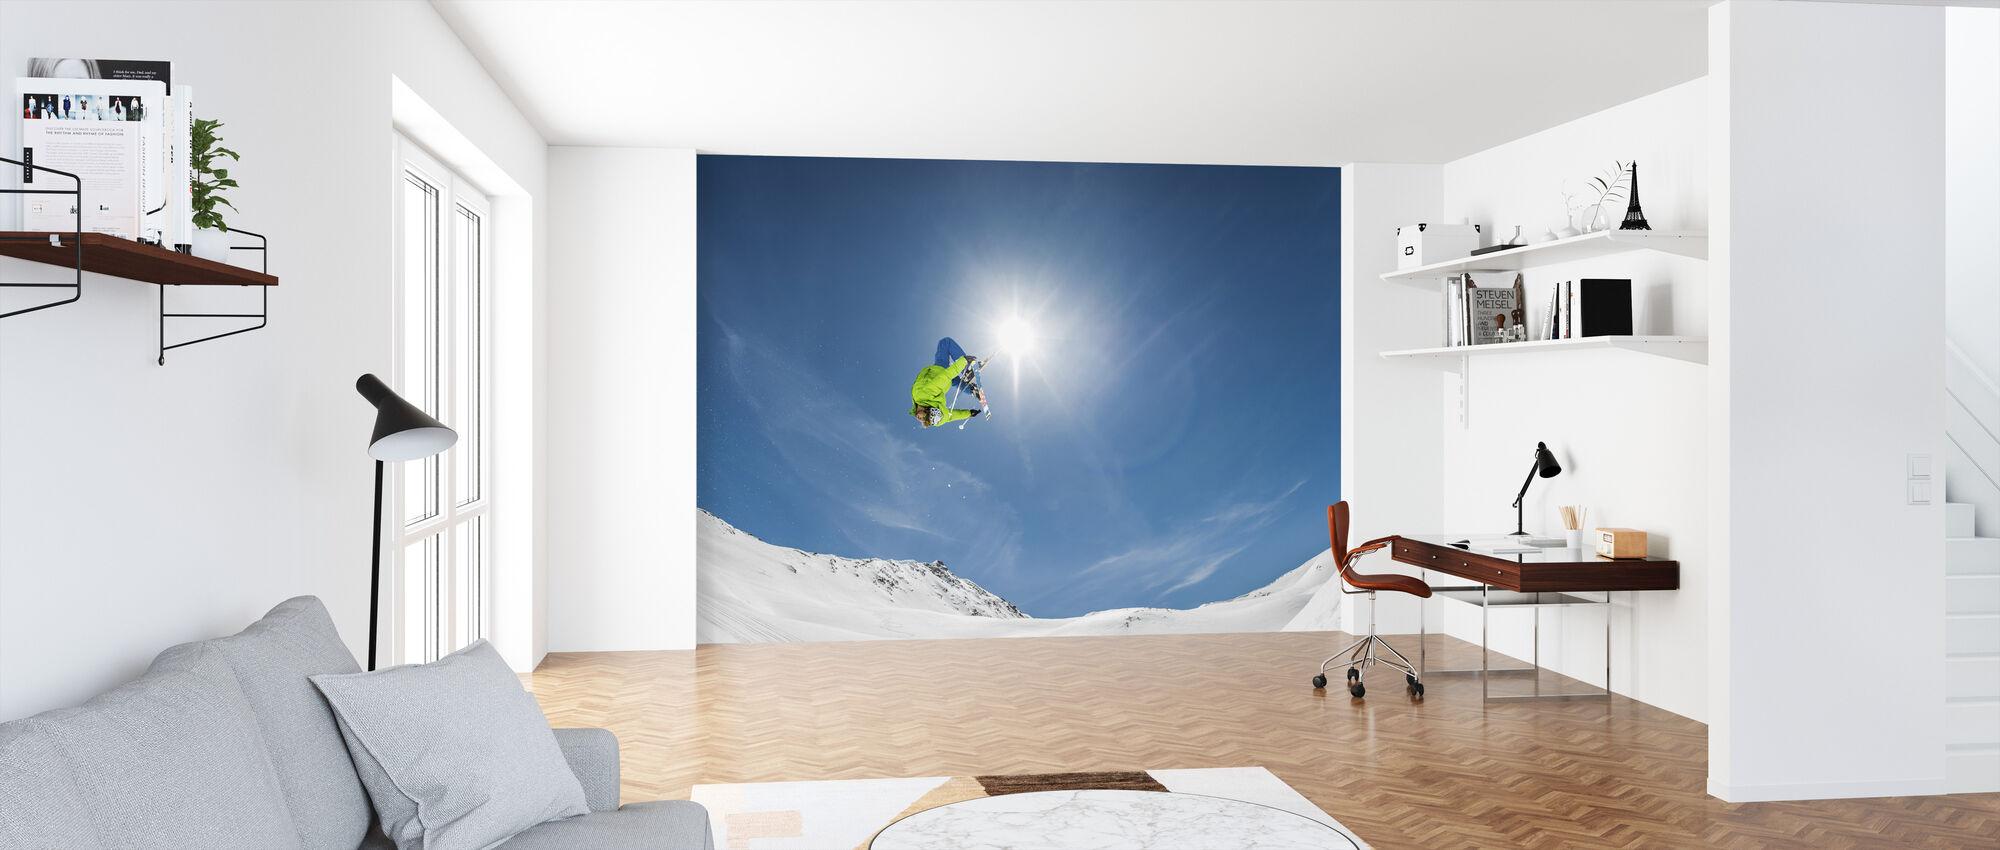 Backflip Crossed Skis - Wallpaper - Office